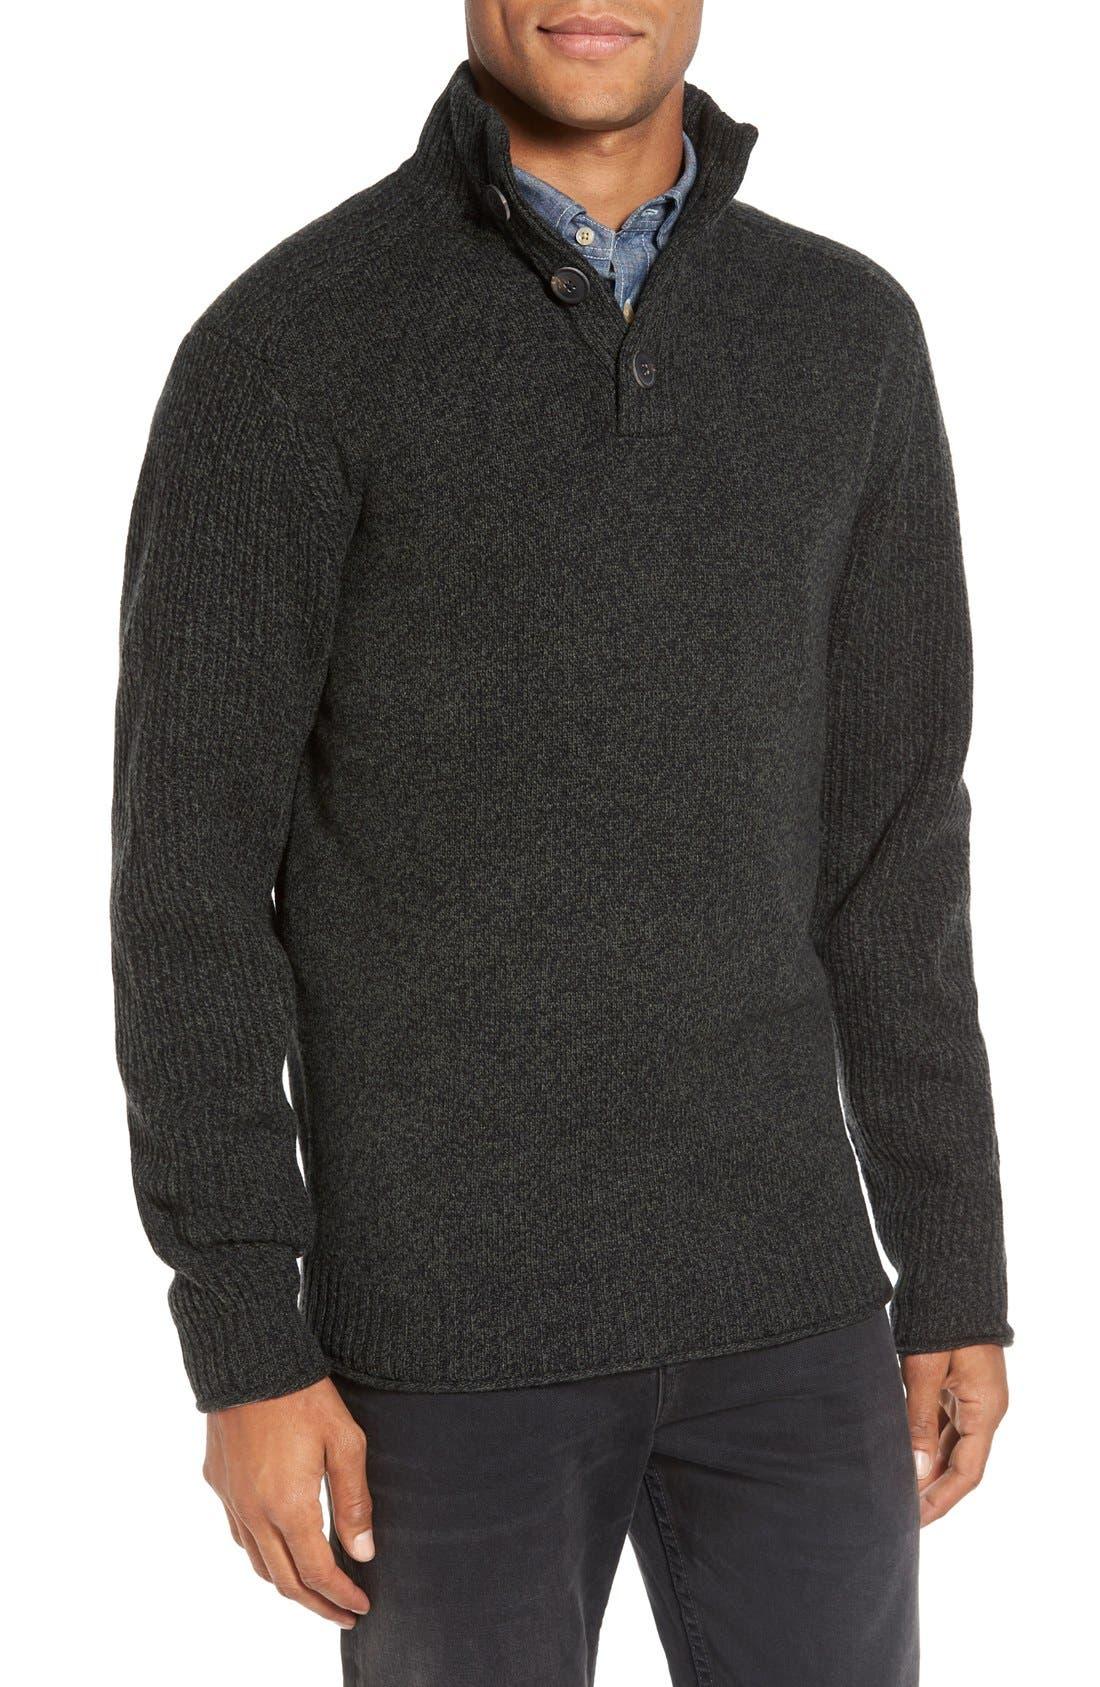 Rodd & Gunn Birkenhead Mock Neck Sweater